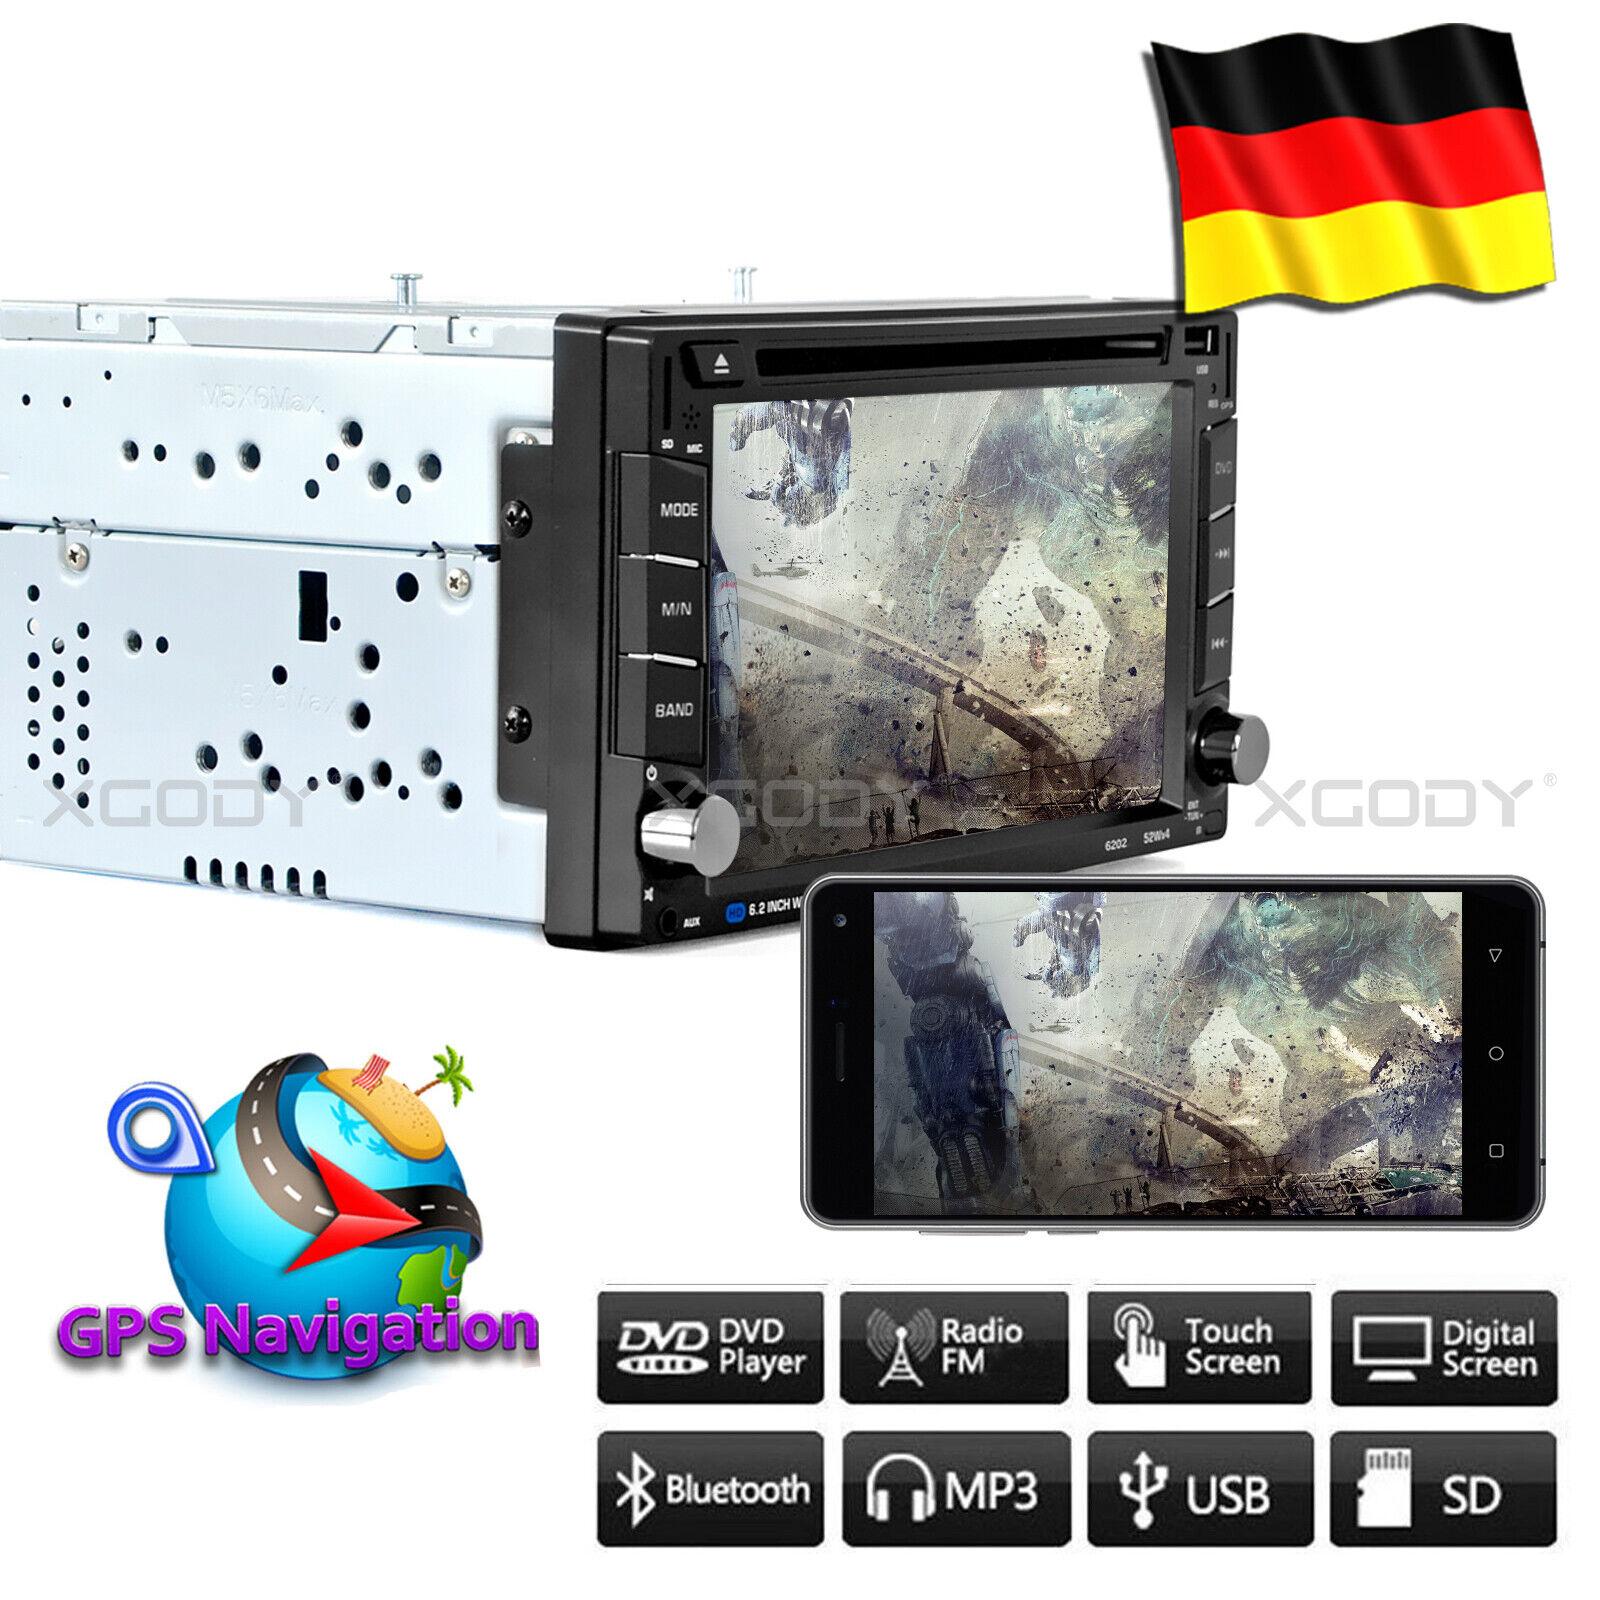 AUTORADIO MIT NAVIGATION TOUCHSCREEN NAVI BLUETOOTH USB GPS CD DVD Doppel 2 DIN